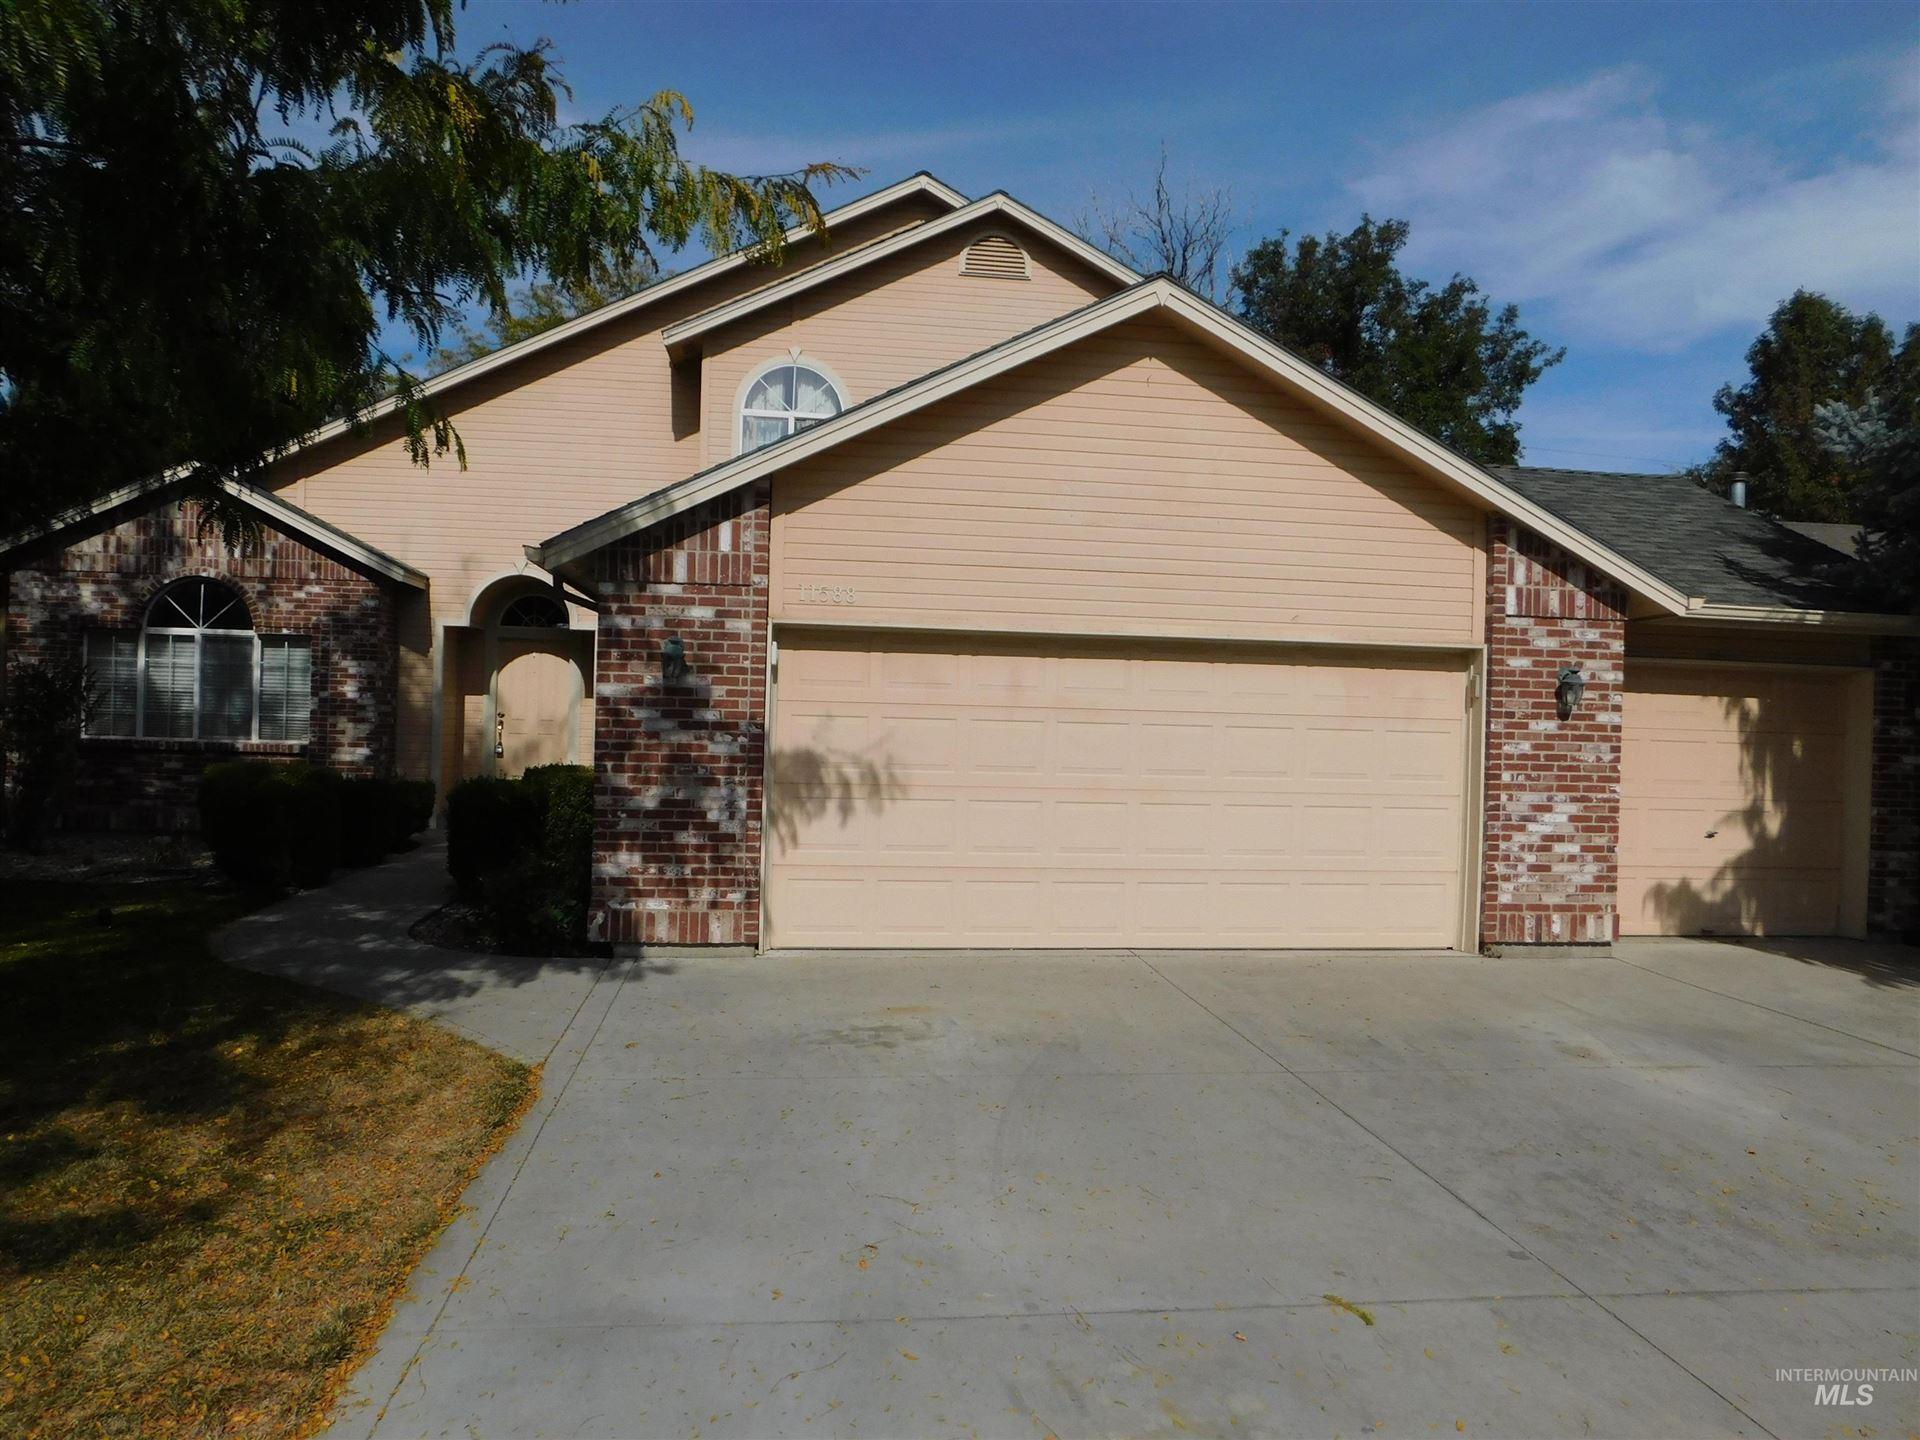 11588 W Colony St, Boise, ID 83709 - MLS#: 98821957